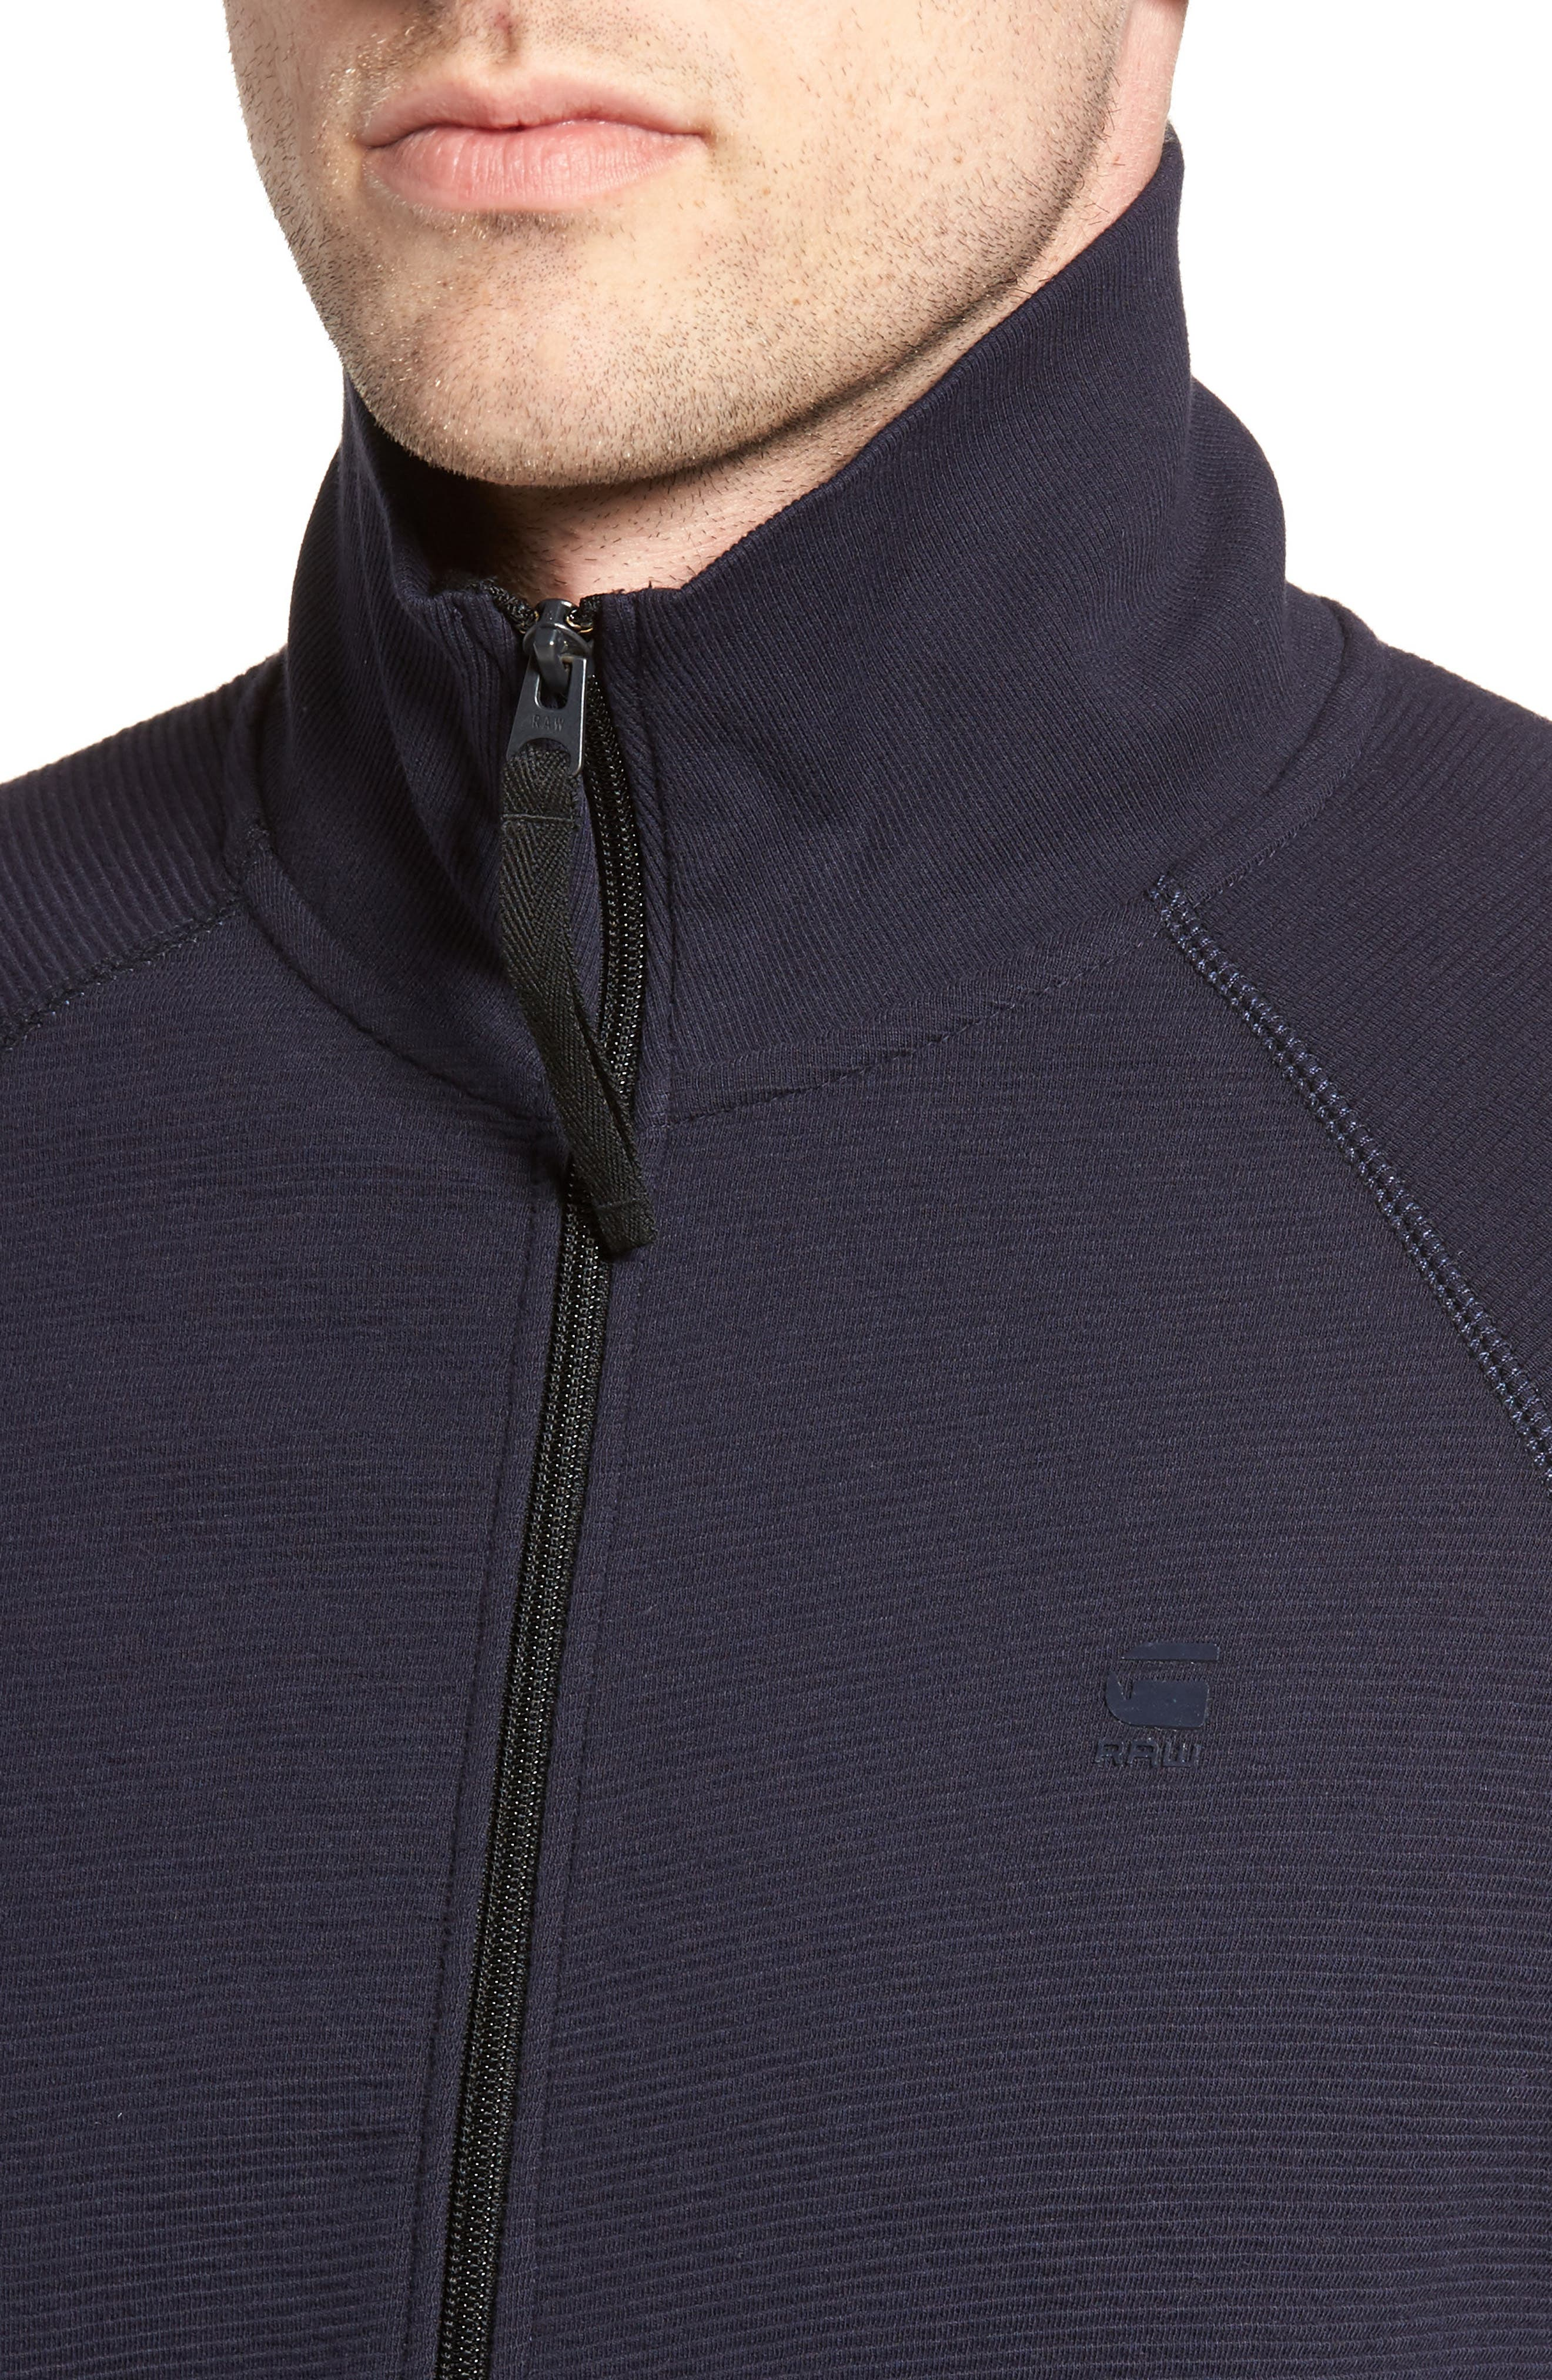 Jirgi Zip Front Jacket,                             Alternate thumbnail 4, color,                             Dark Naval Blue